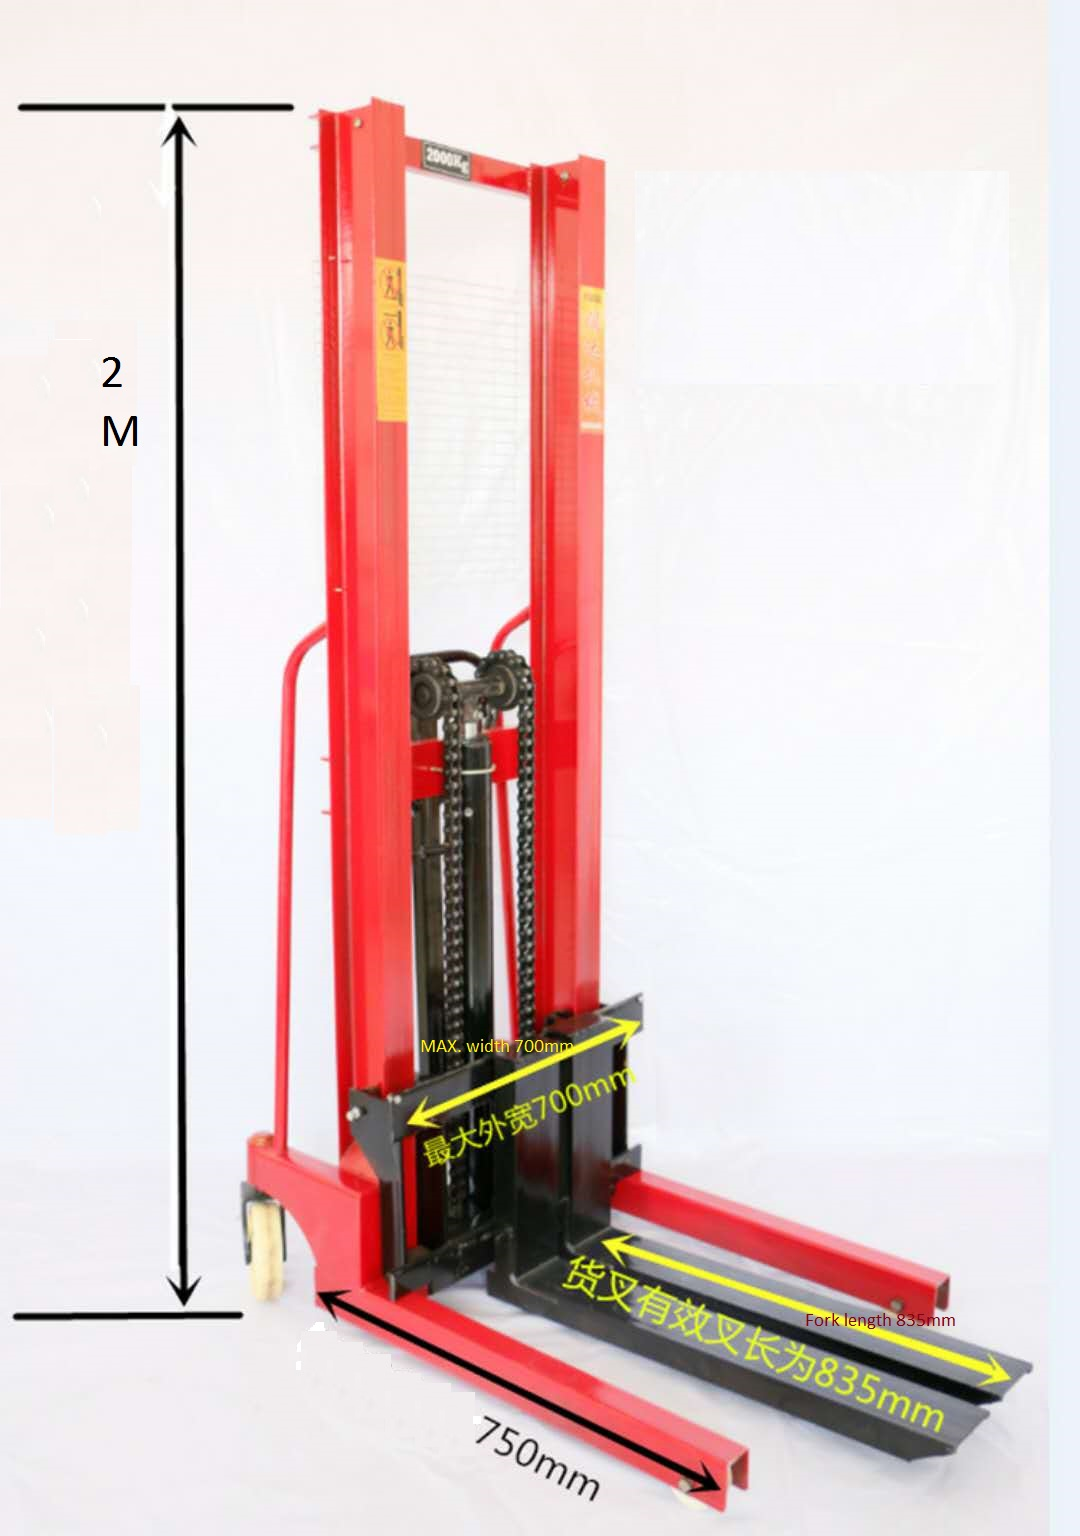 kalmar 1.5 ton 3ton manual jack ac pump hand pallet truck hydraulic lifter